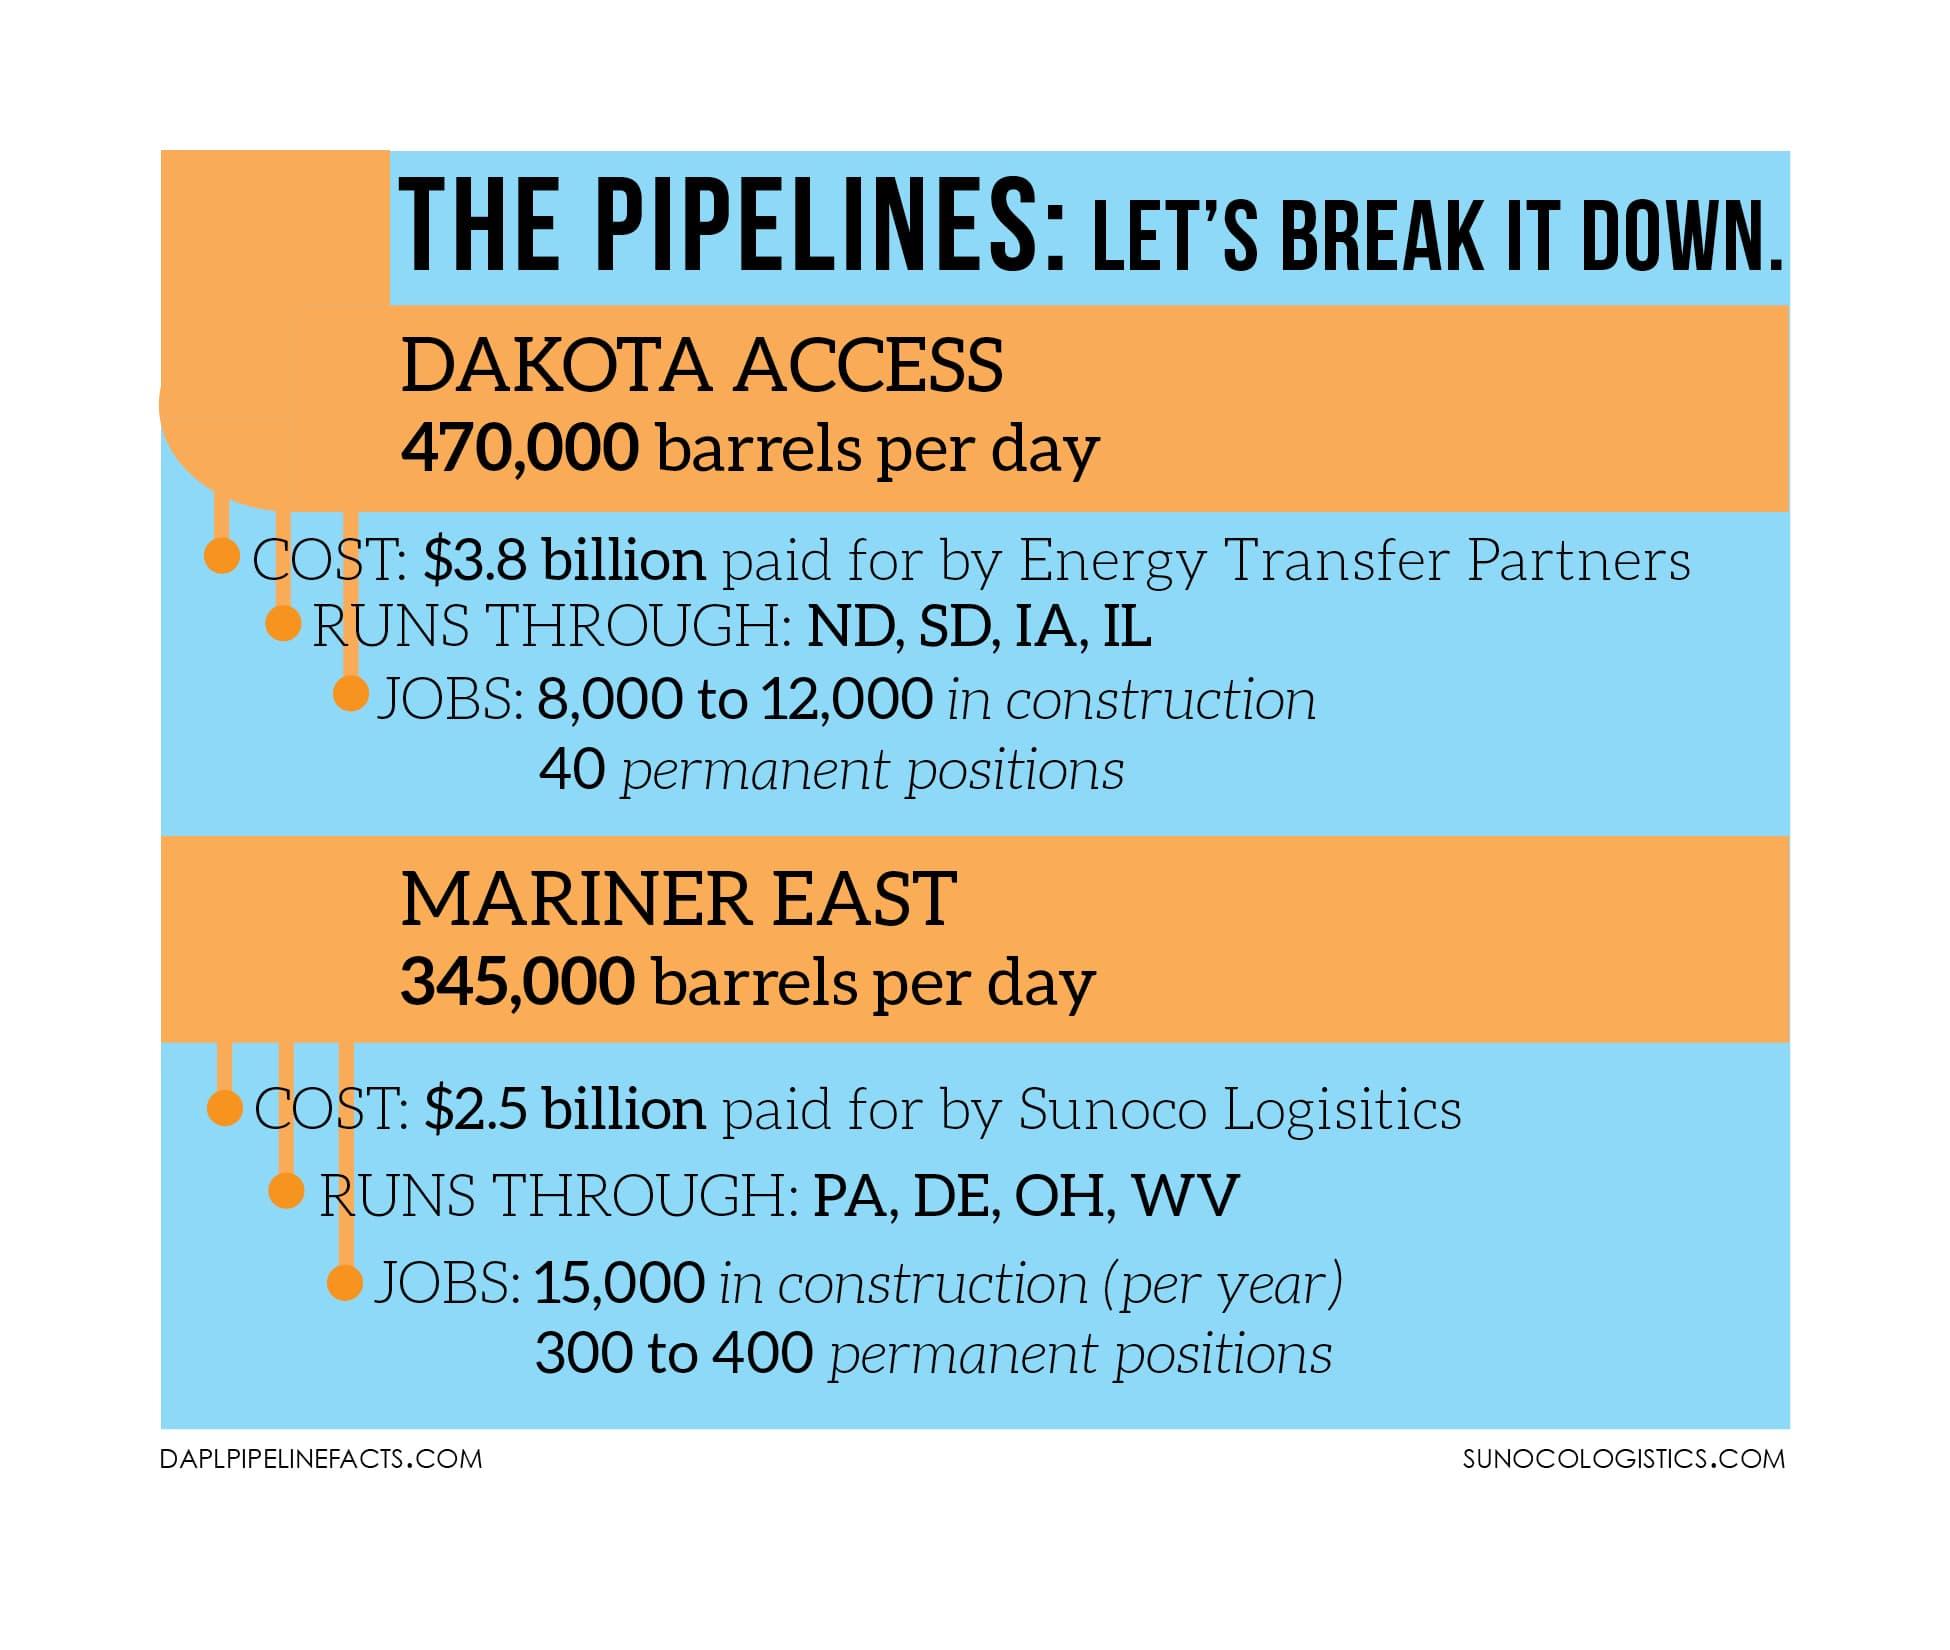 pipelines harm long term jobs